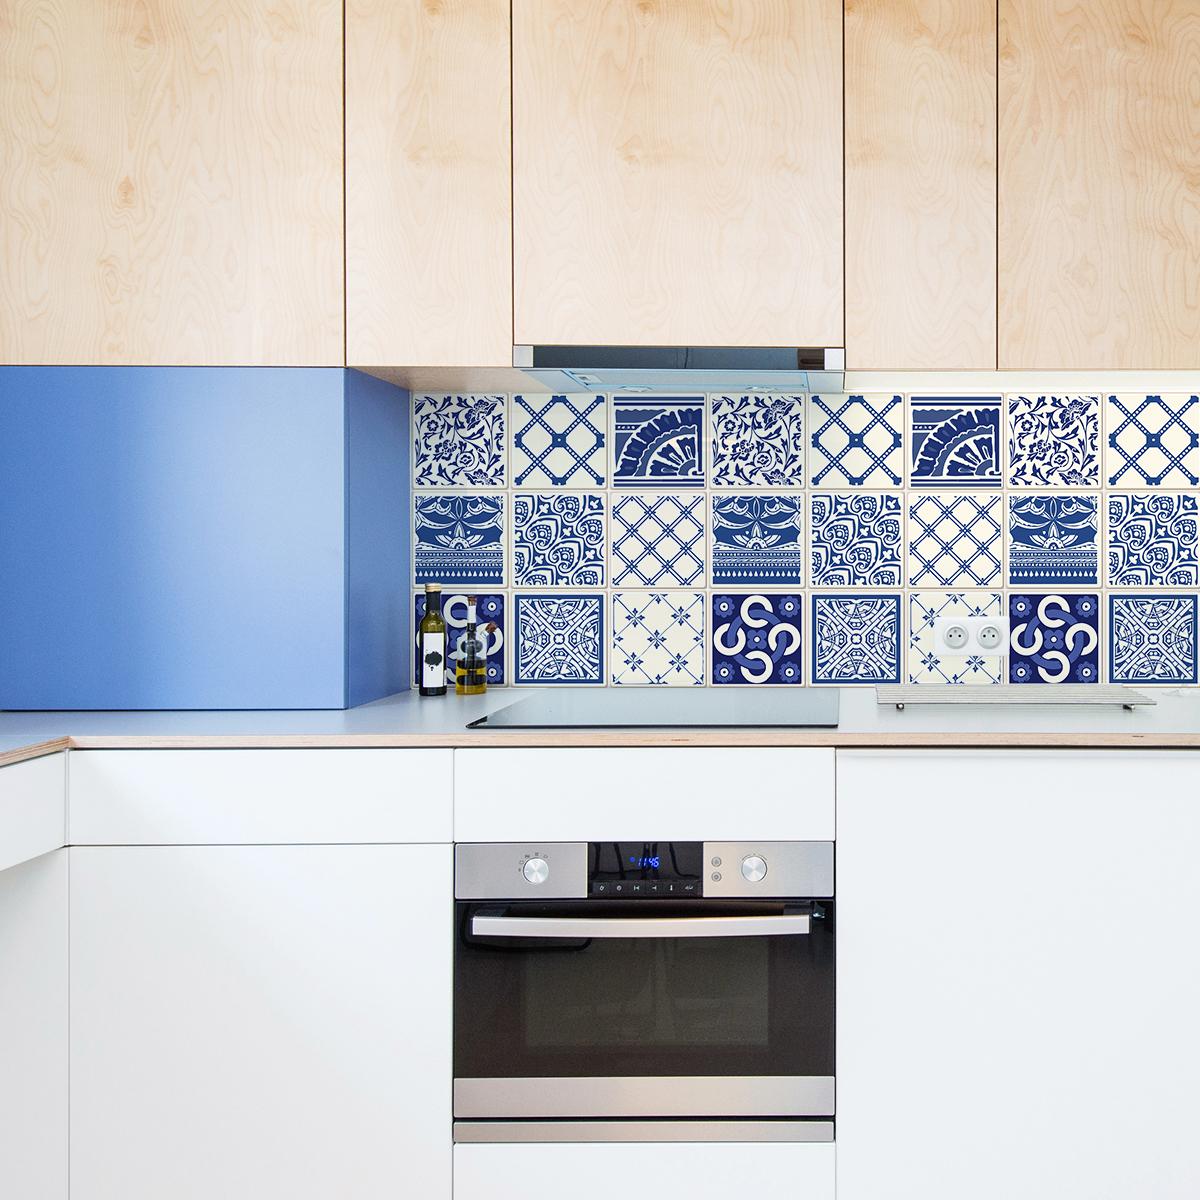 24 stickers carreaux de ciment azulejos dionisio cuisine carrelages ambiance sticker. Black Bedroom Furniture Sets. Home Design Ideas